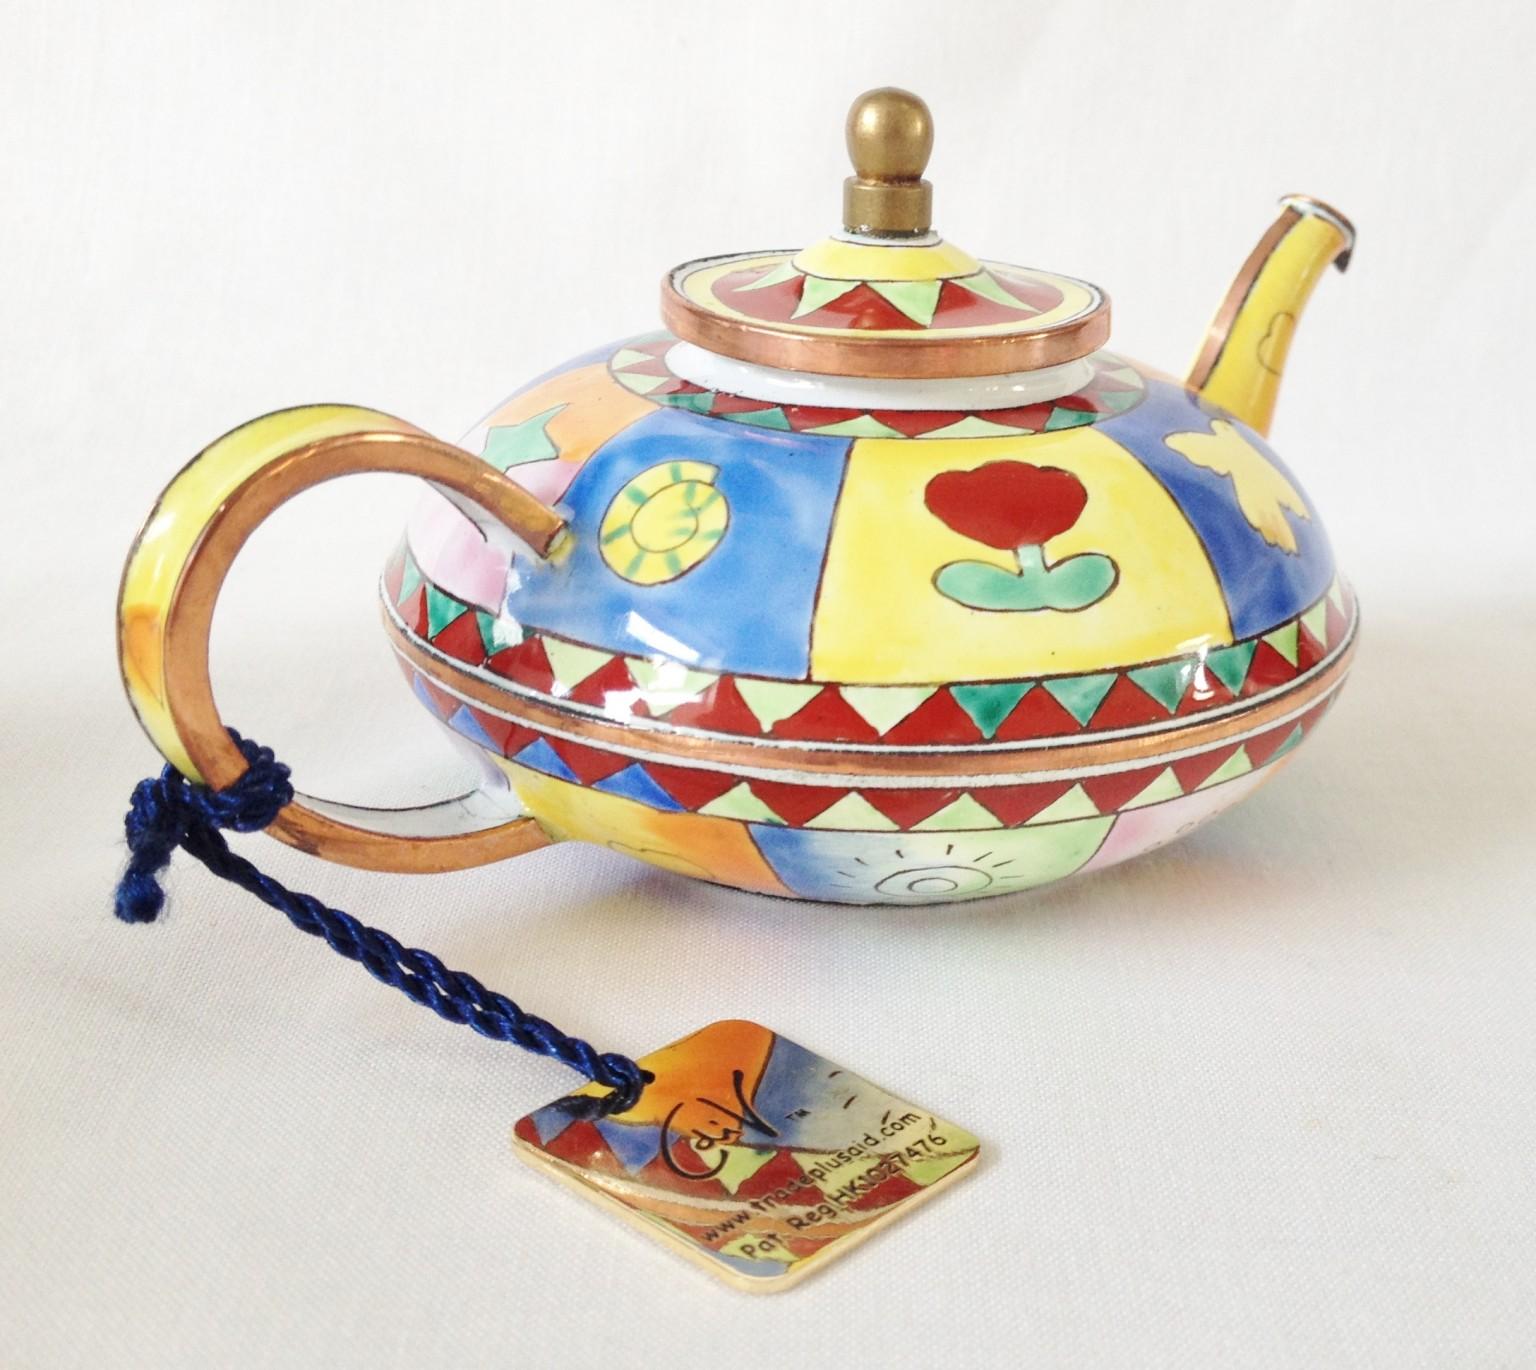 nivag collectables charlotte di vita magic carpet magic carpet teapot. Black Bedroom Furniture Sets. Home Design Ideas